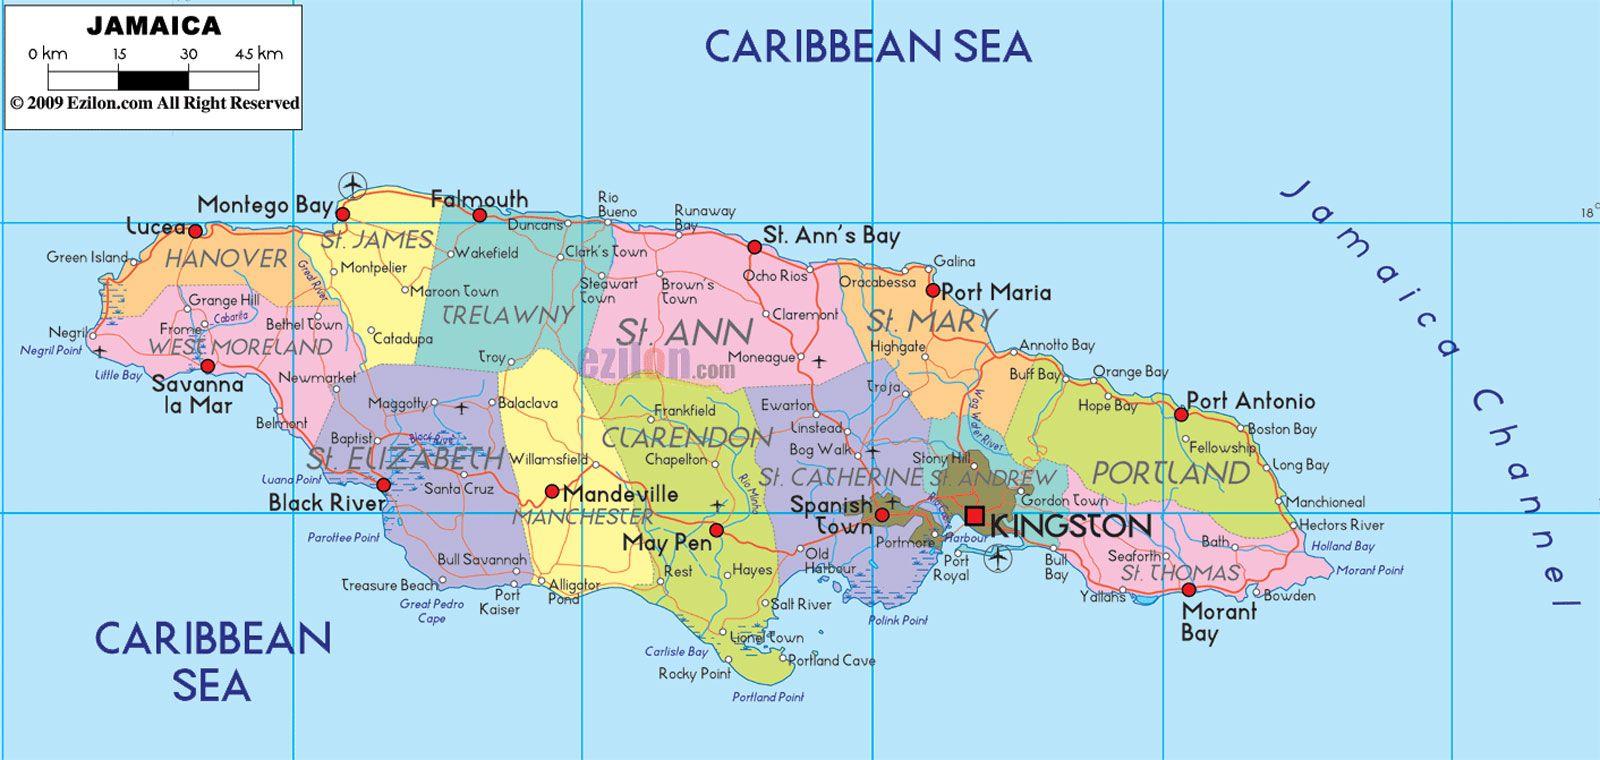 Despite its location almost smack in the center of the Caribbean Sea